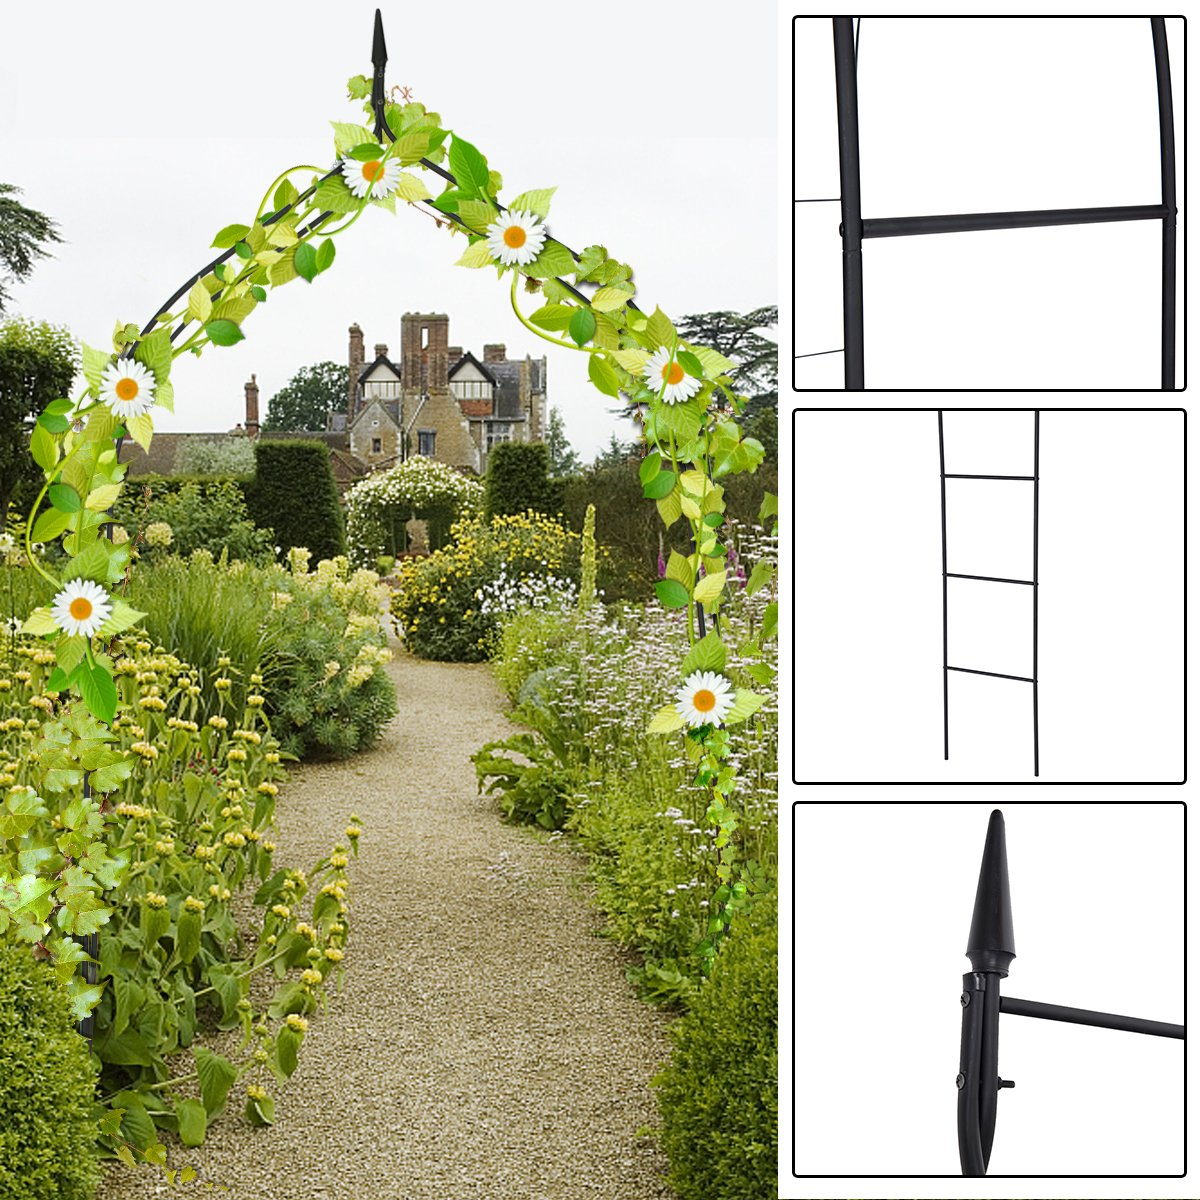 Casart Garden Arch Metal Pergola Arbor Archway Plants Flowers Roes Climbing Wedding Yard Backyard Lawn Outdoor (Style A)